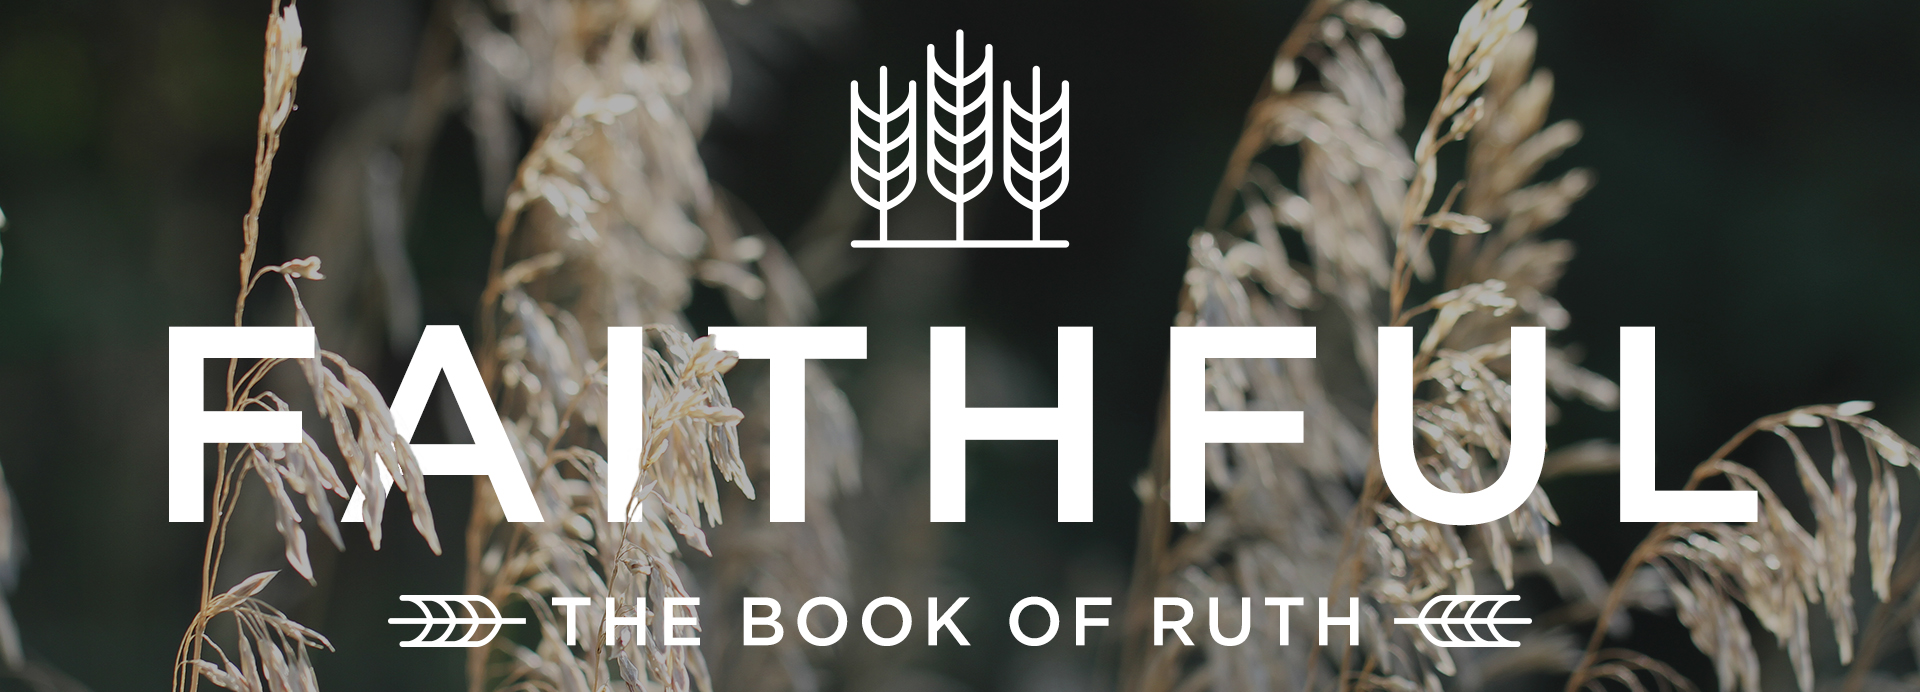 Ruth_banner.jpg